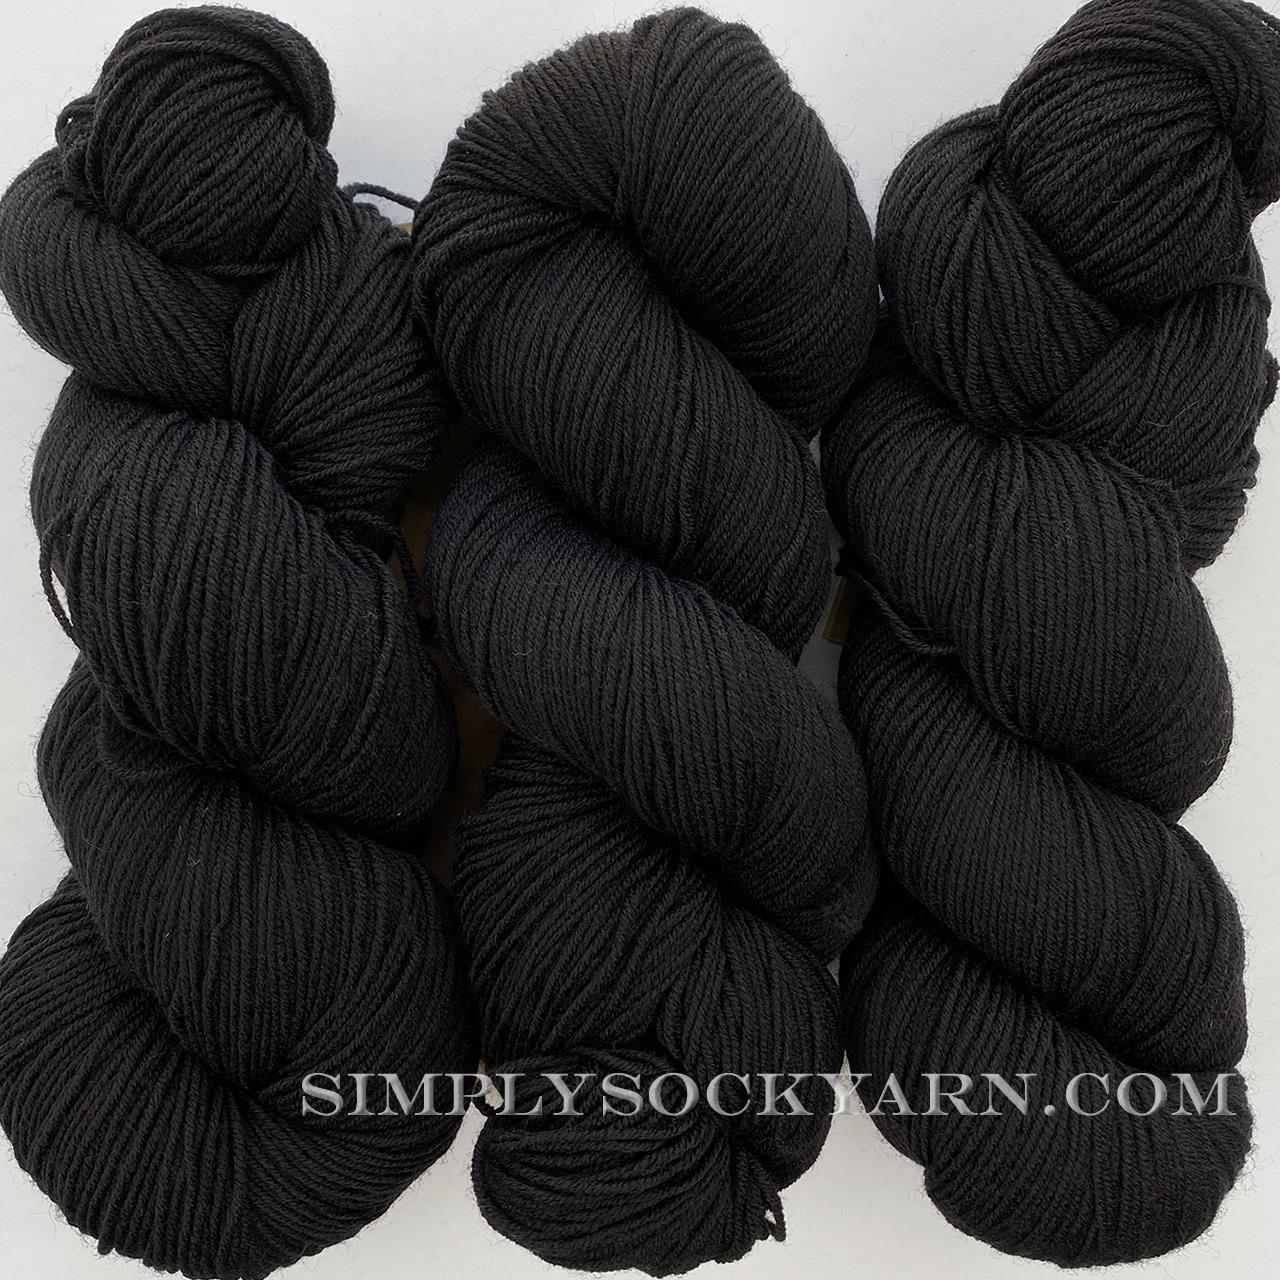 Urth Harvest Thuja (black) -